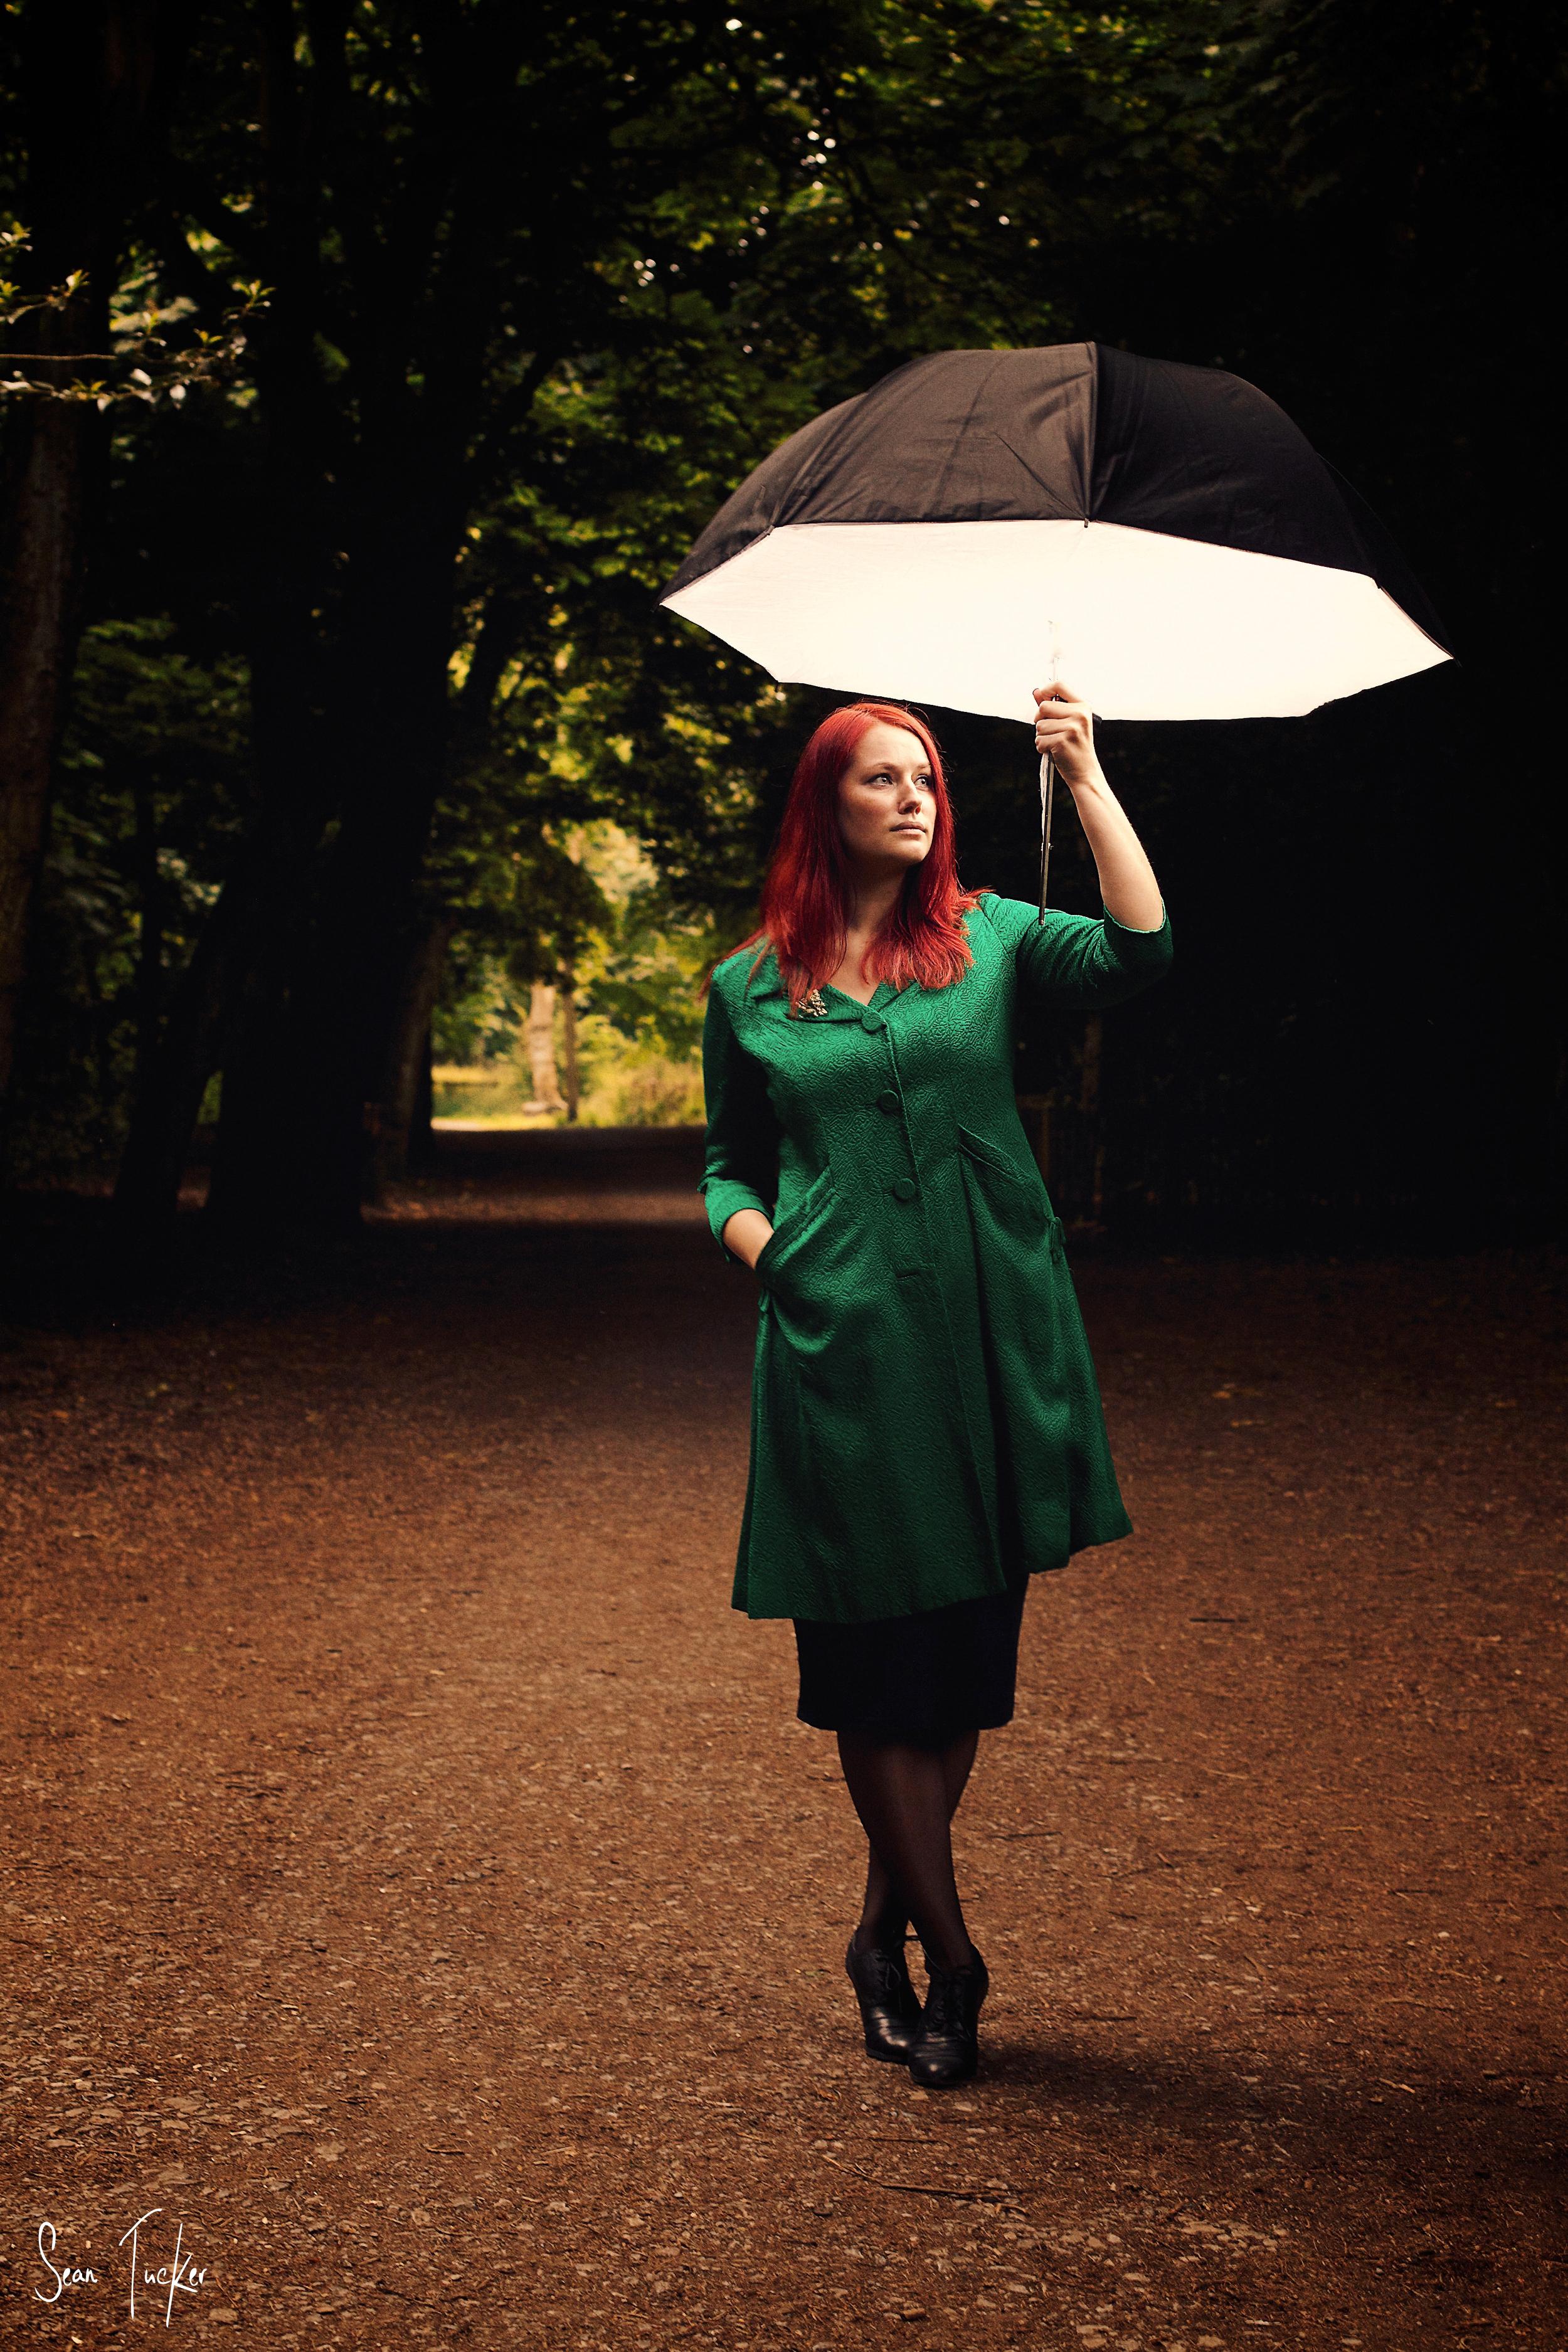 Umbrella final.jpg